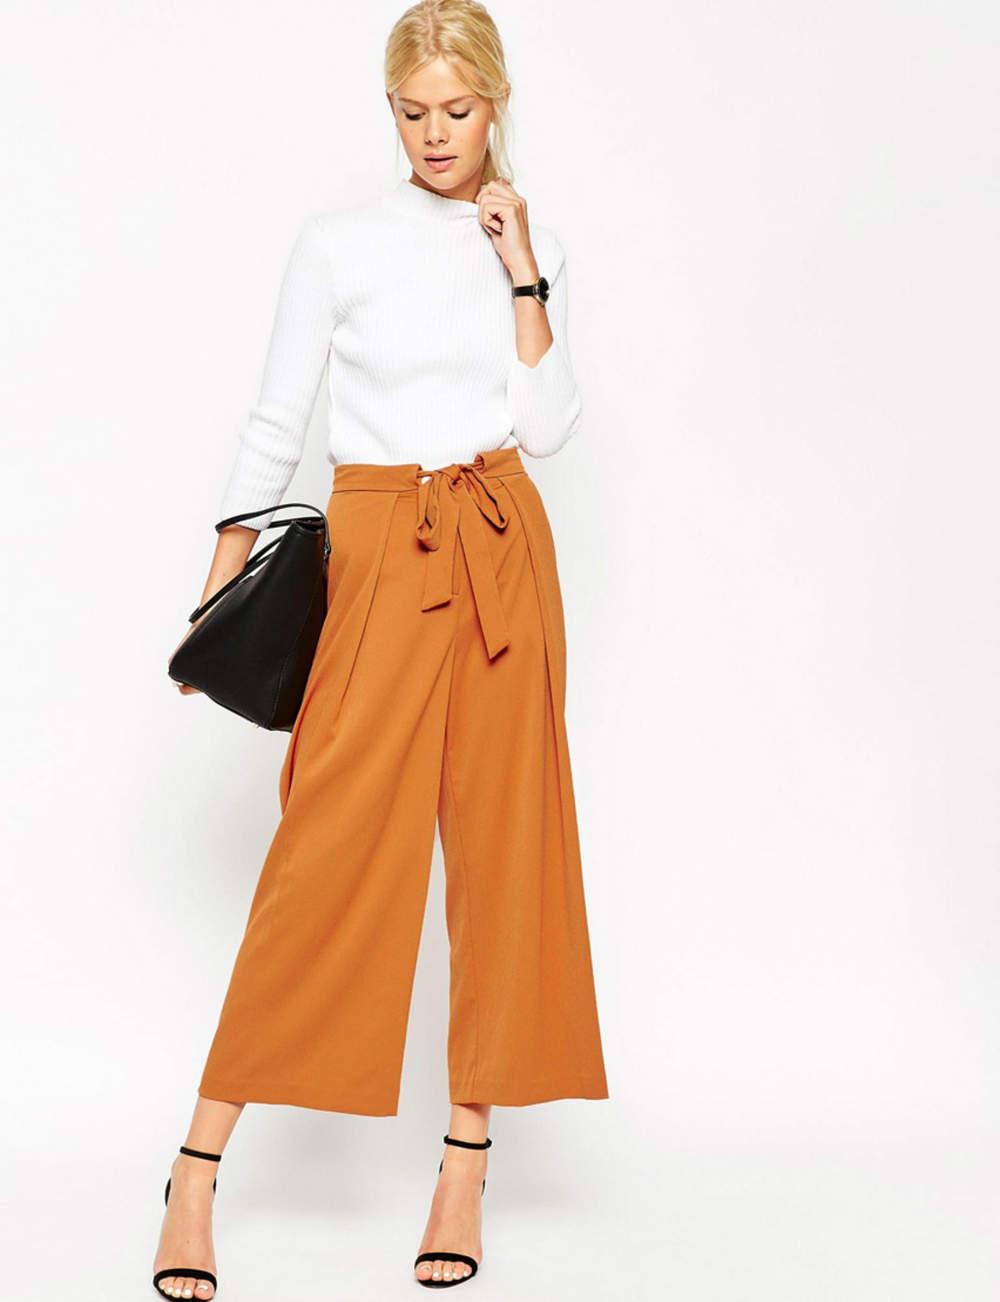 Façon jupe culotte